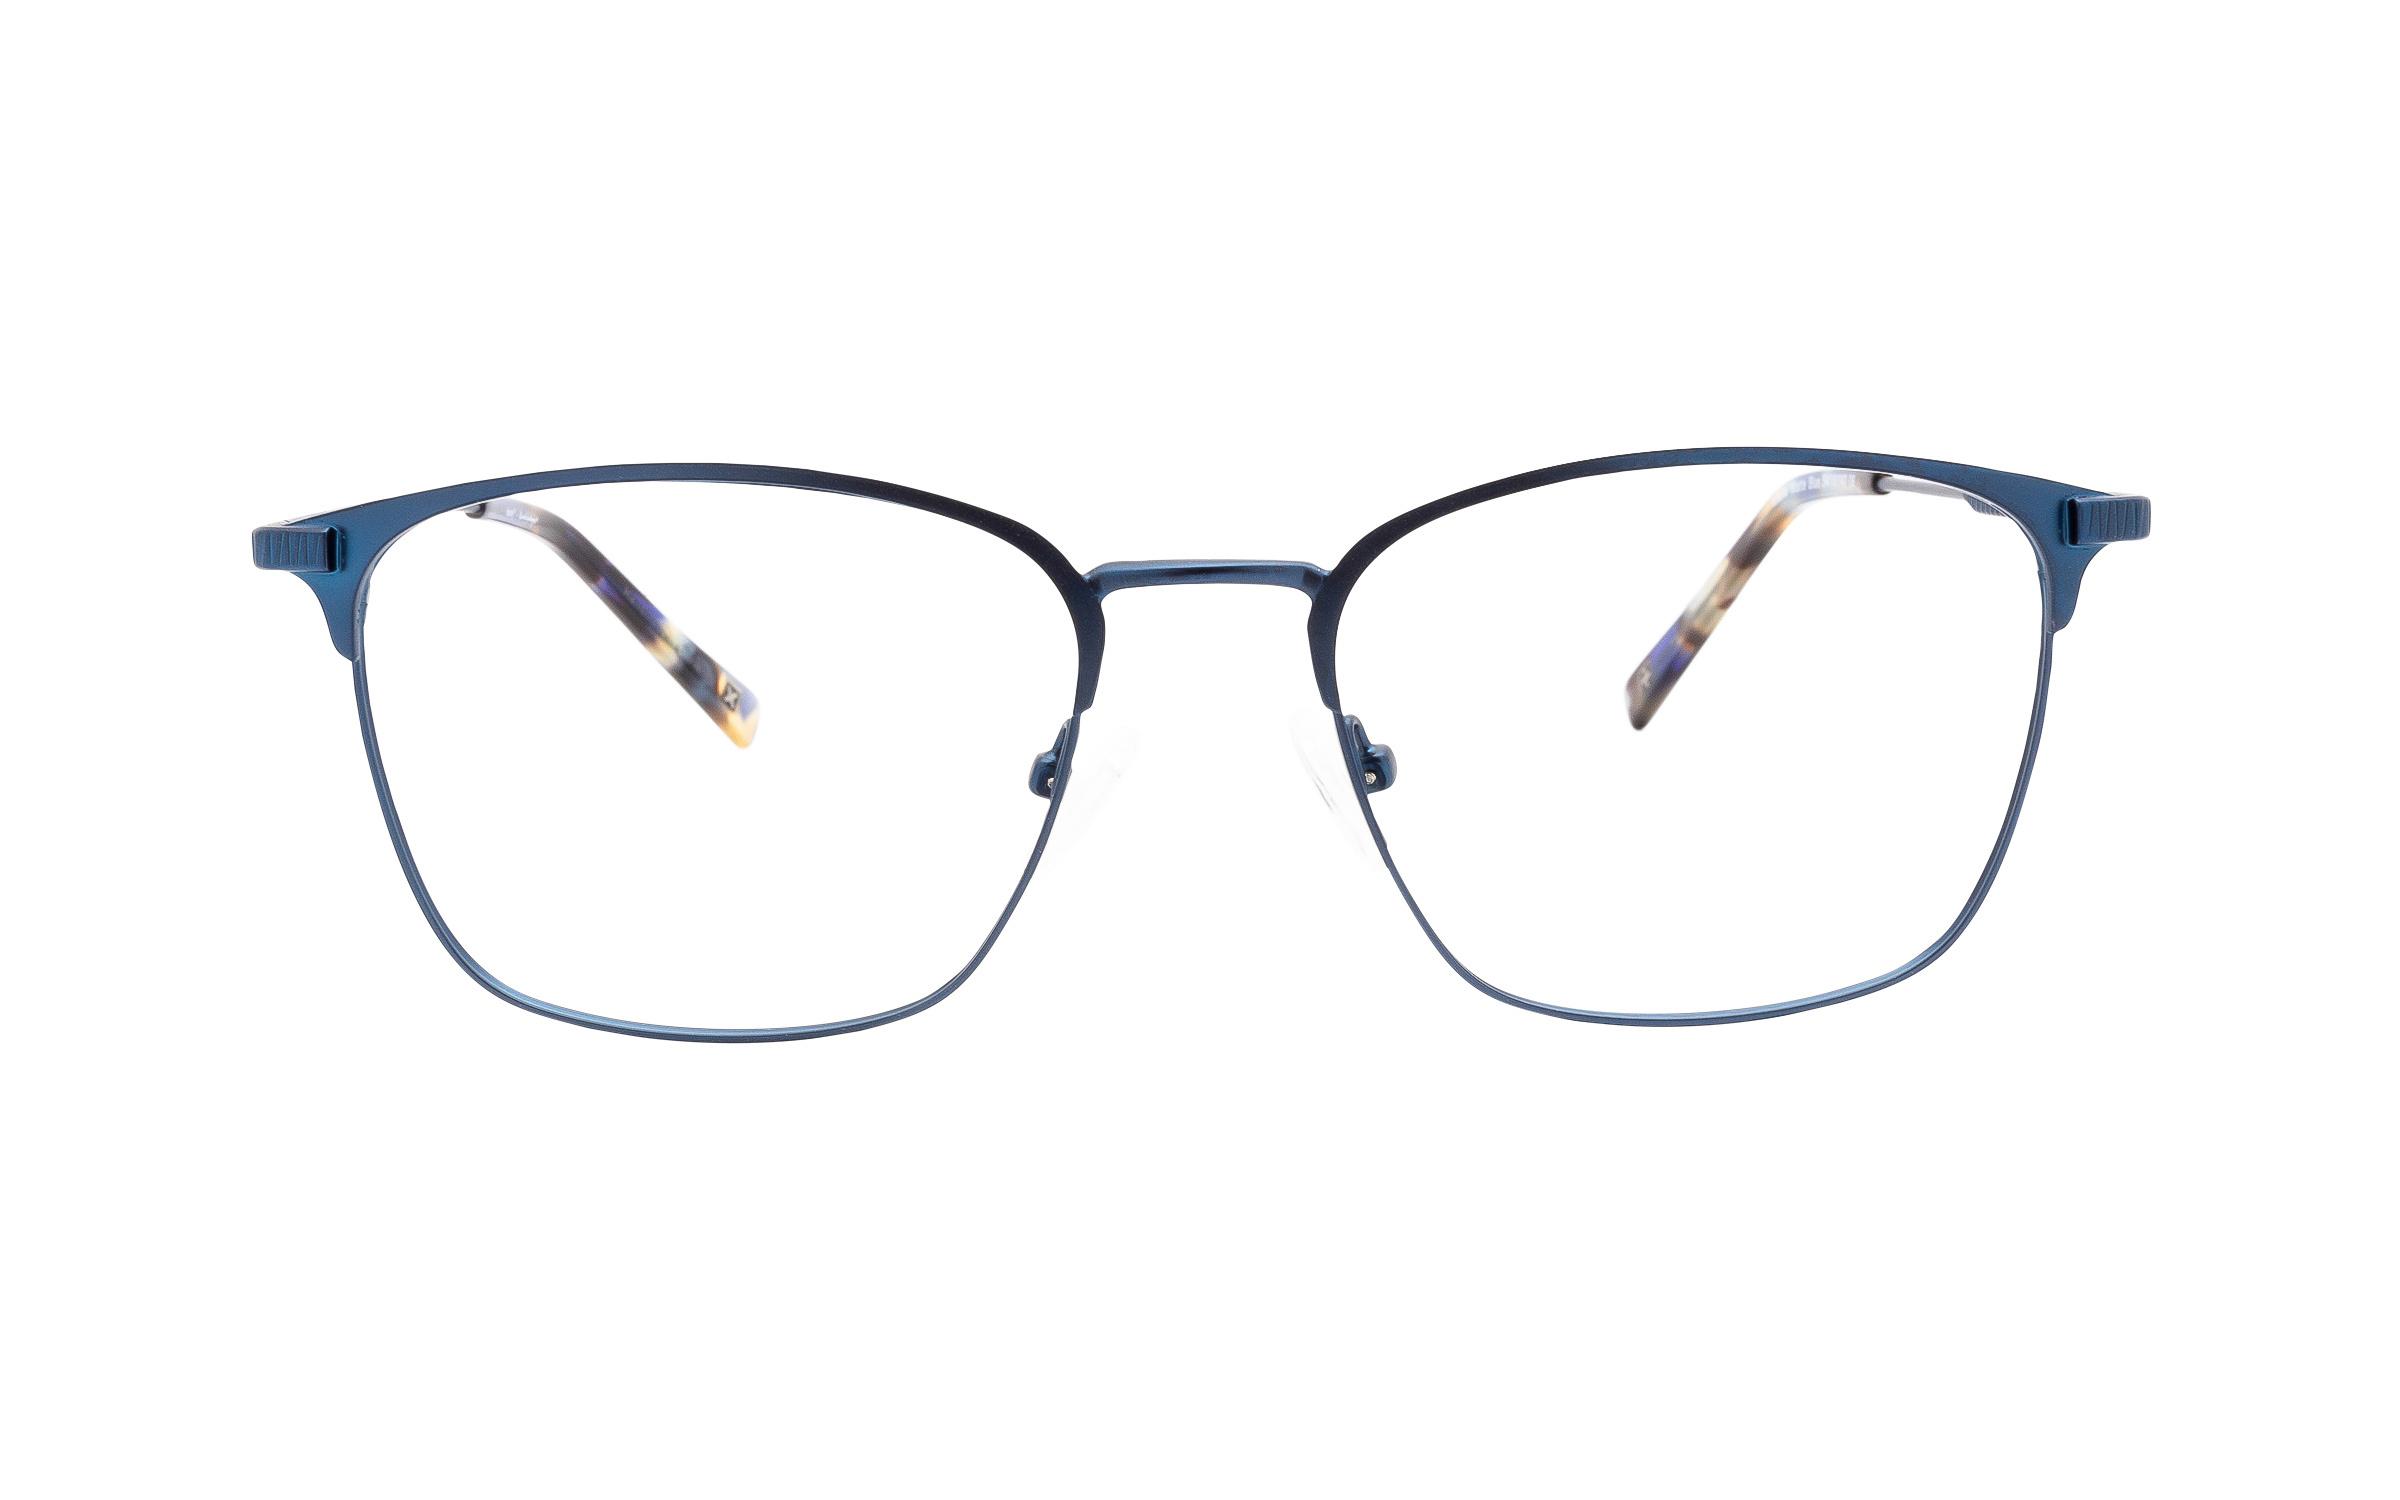 http://www.coastal.com/ - Derek Cardigan Maia DC222 C03 (54) Eyeglasses and Frame in Matte Blue | Metal – Online Coastal